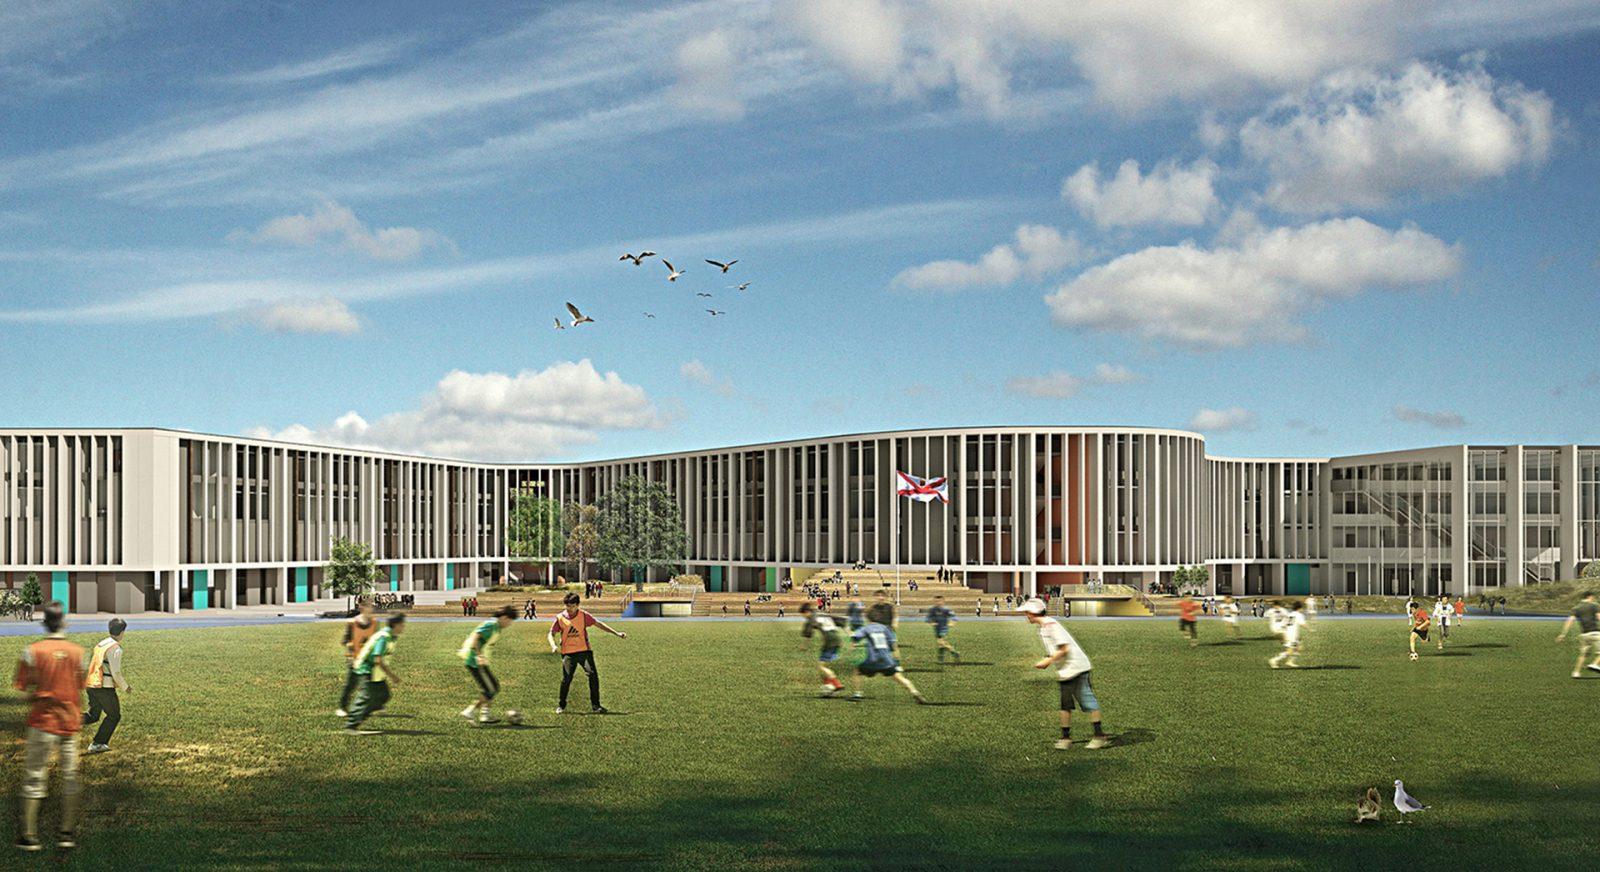 FT les quennavais school modern architecture st brelade jersey architecture14